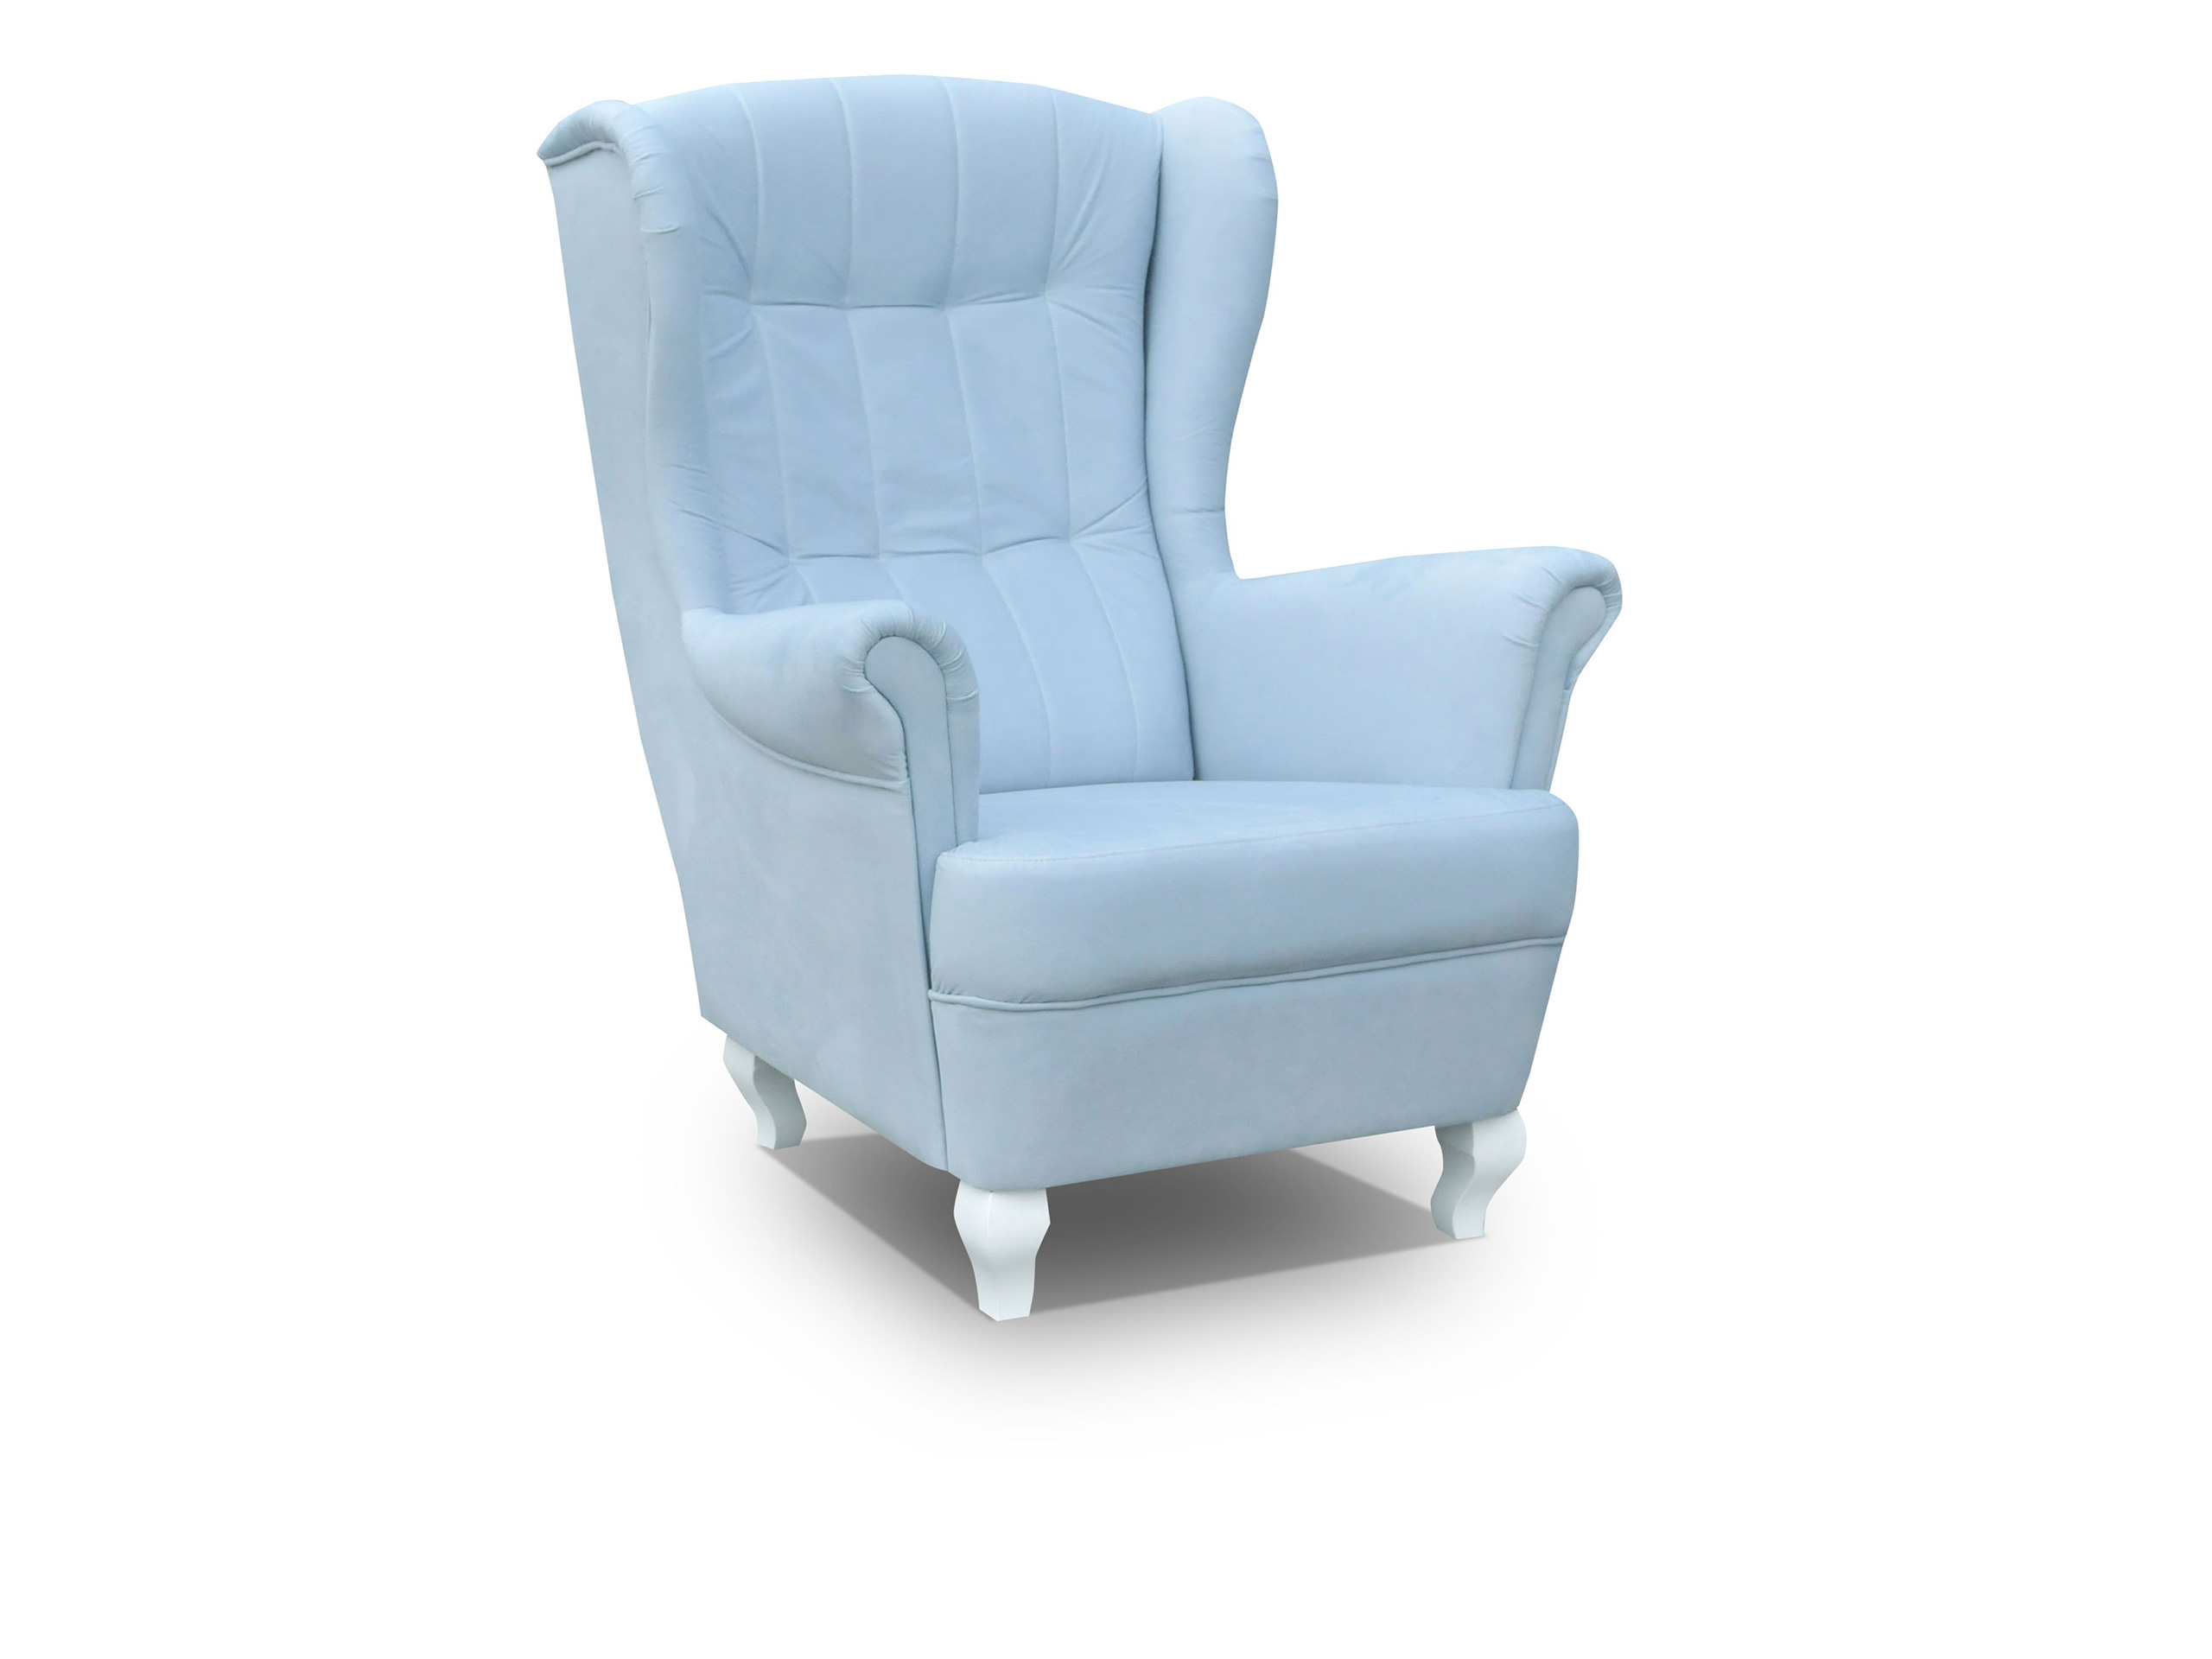 оснащен кресло ткань аморе терра фото боевики